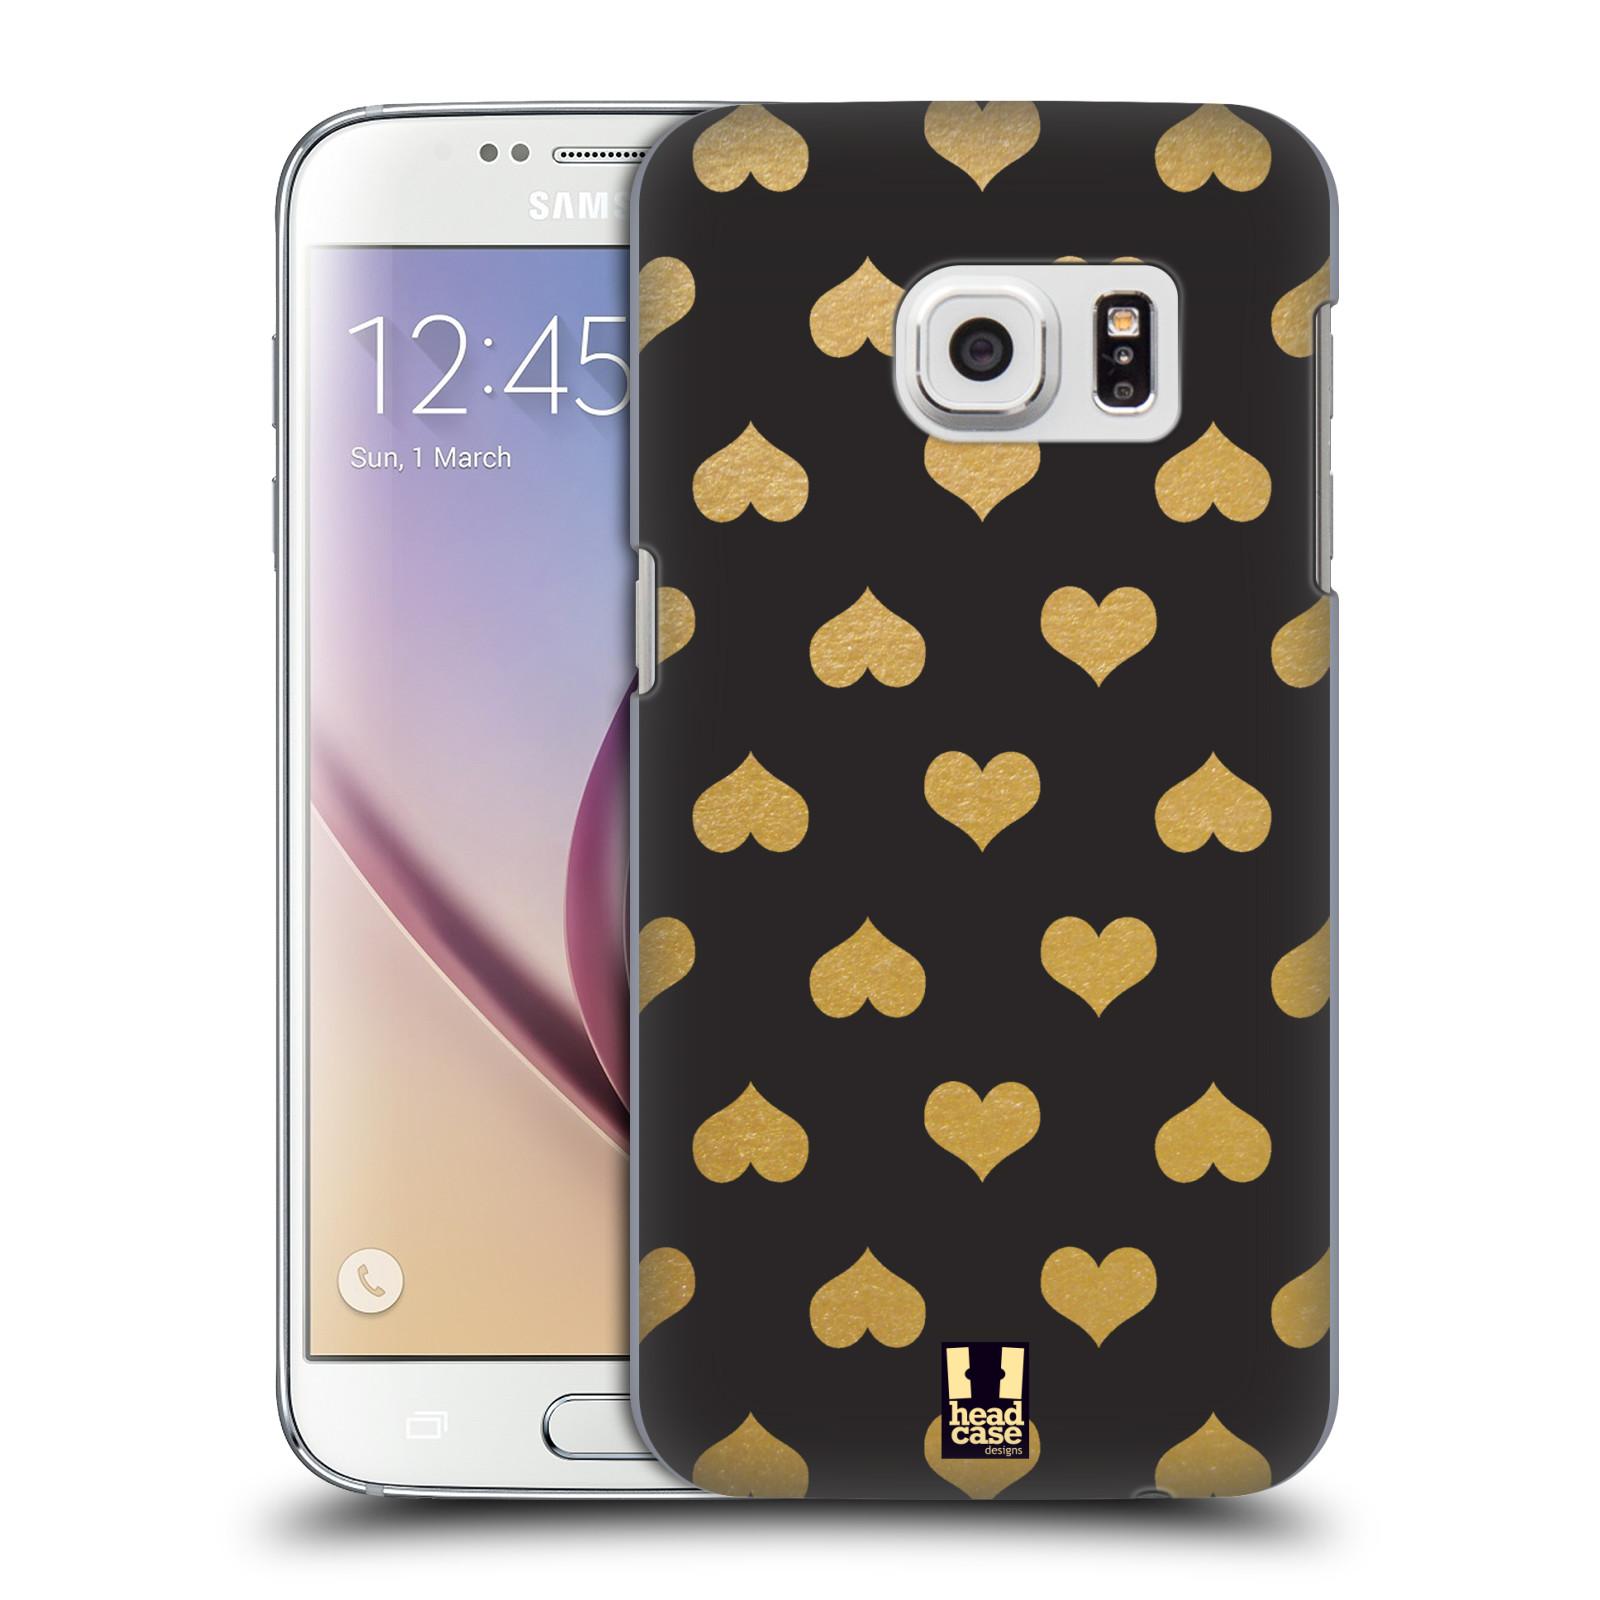 Plastové pouzdro na mobil Samsung Galaxy S7 HEAD CASE ZLATÁ SRDÍČKA (Kryt či obal na mobilní telefon Samsung Galaxy S7 SM-G930F)